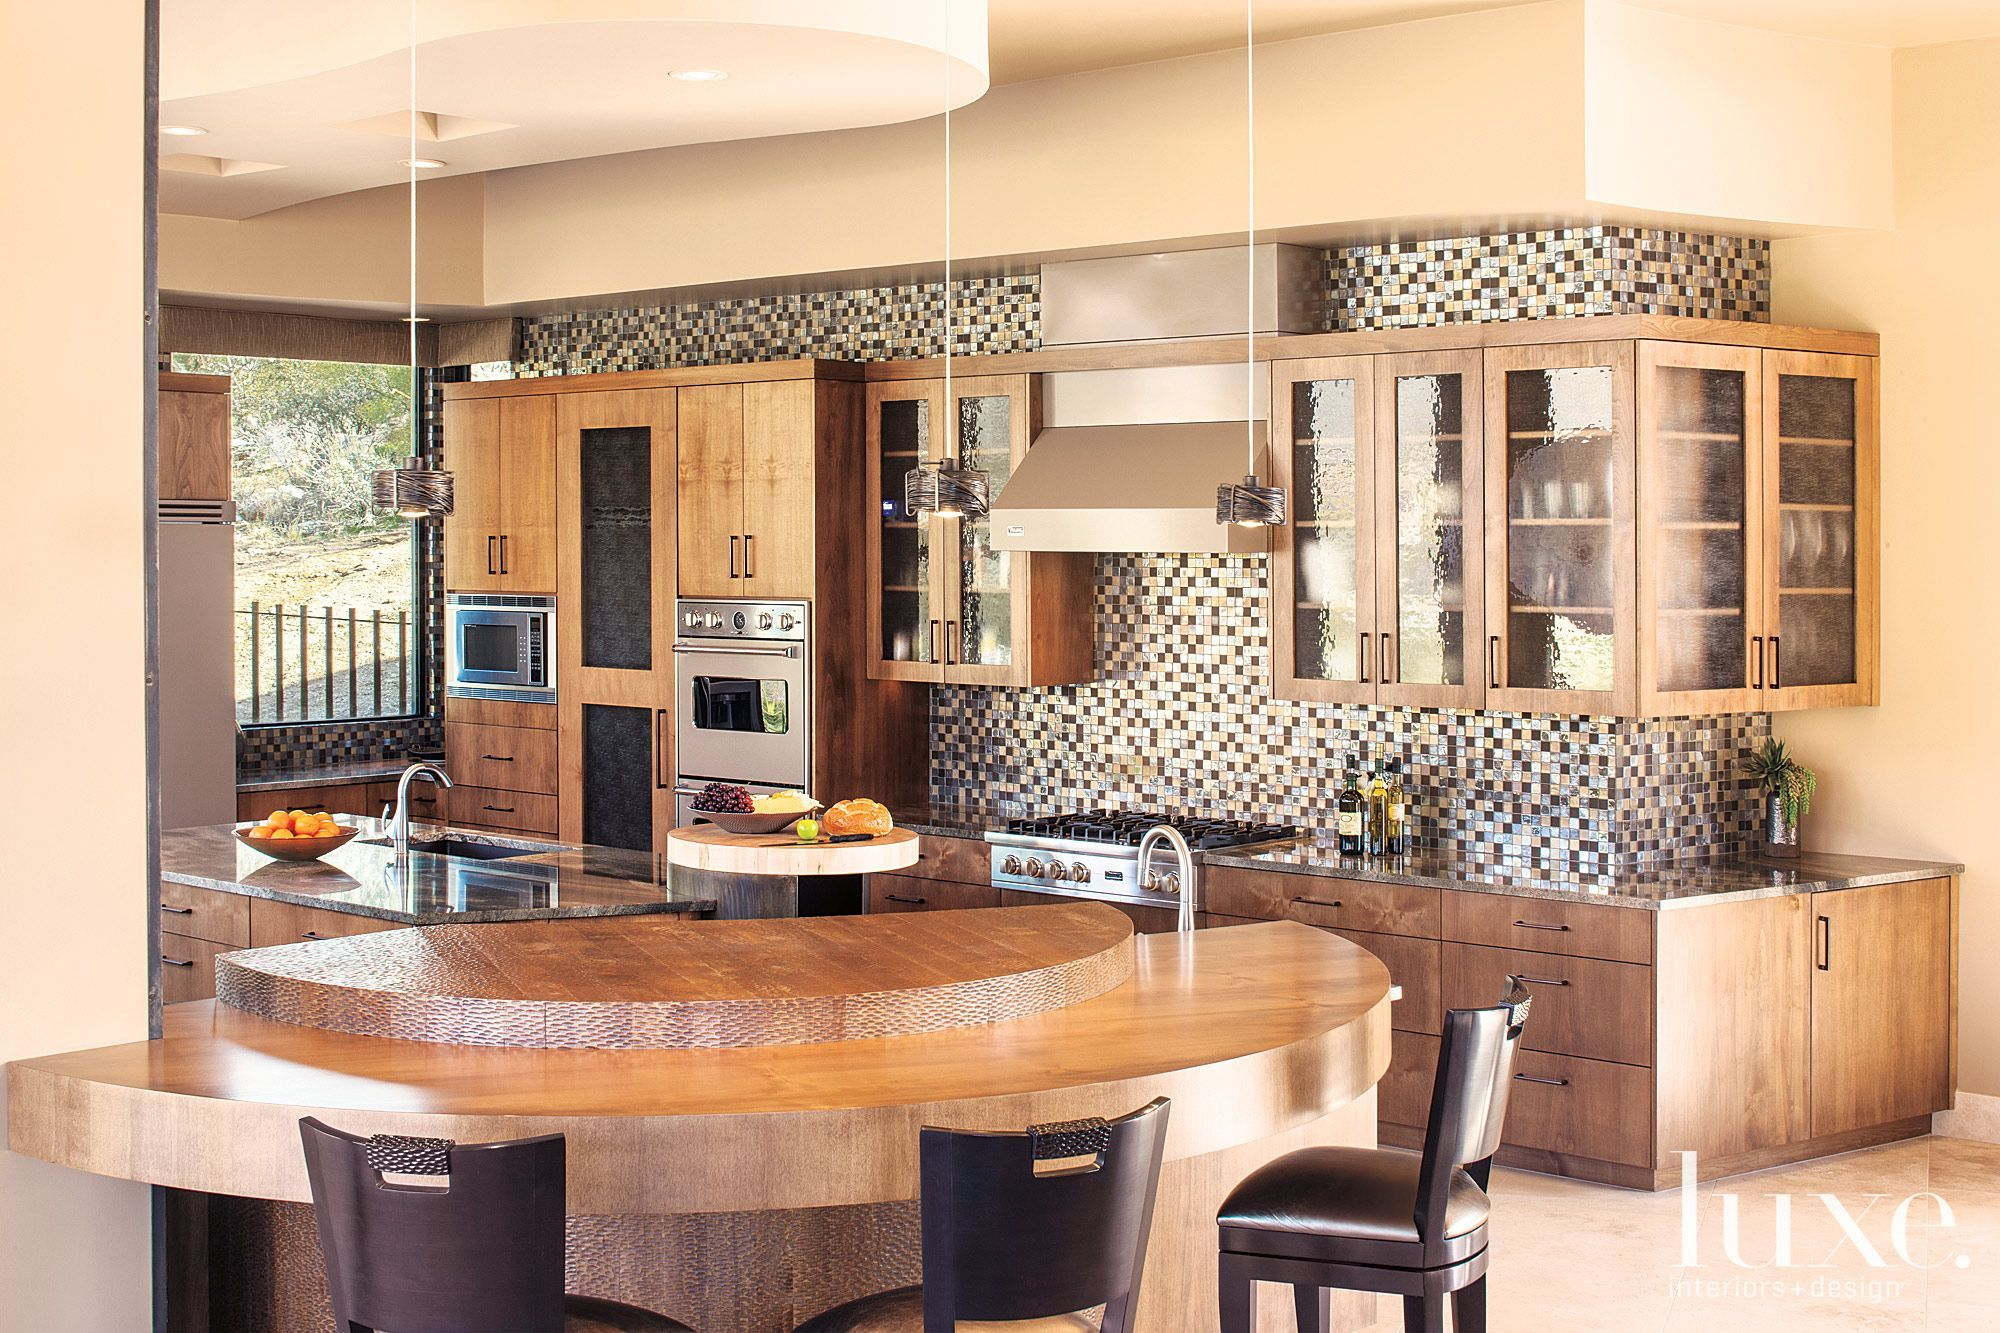 Pin by Paquita Moreno on Home ideas, decor and design